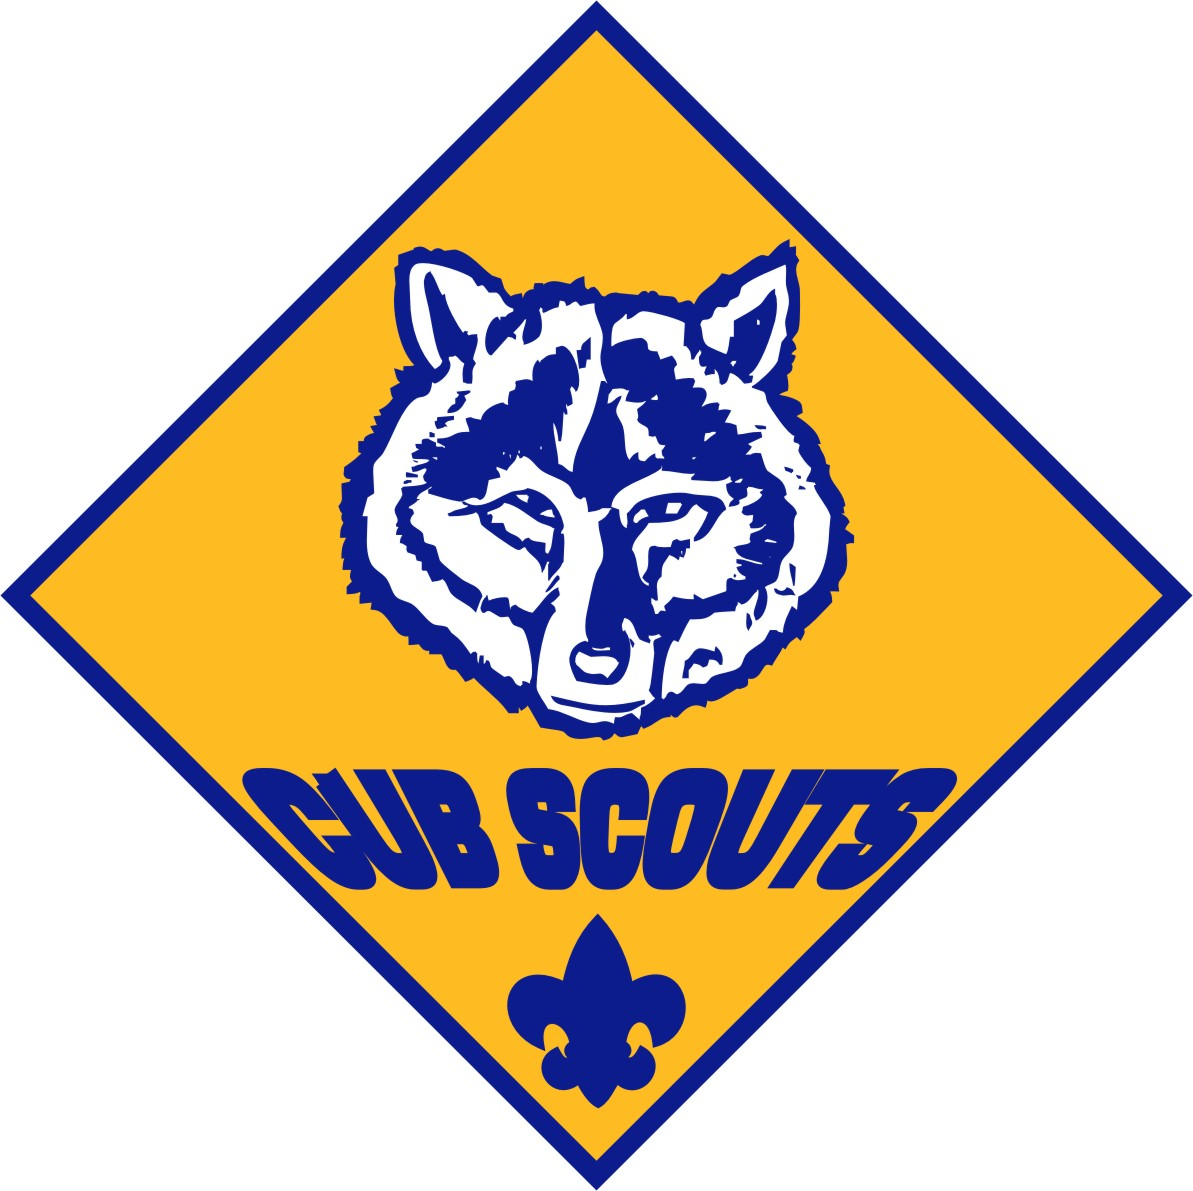 Cub scout emblems clipart clipart black and white Cub Scouts Clipart | Free download best Cub Scouts Clipart ... clipart black and white